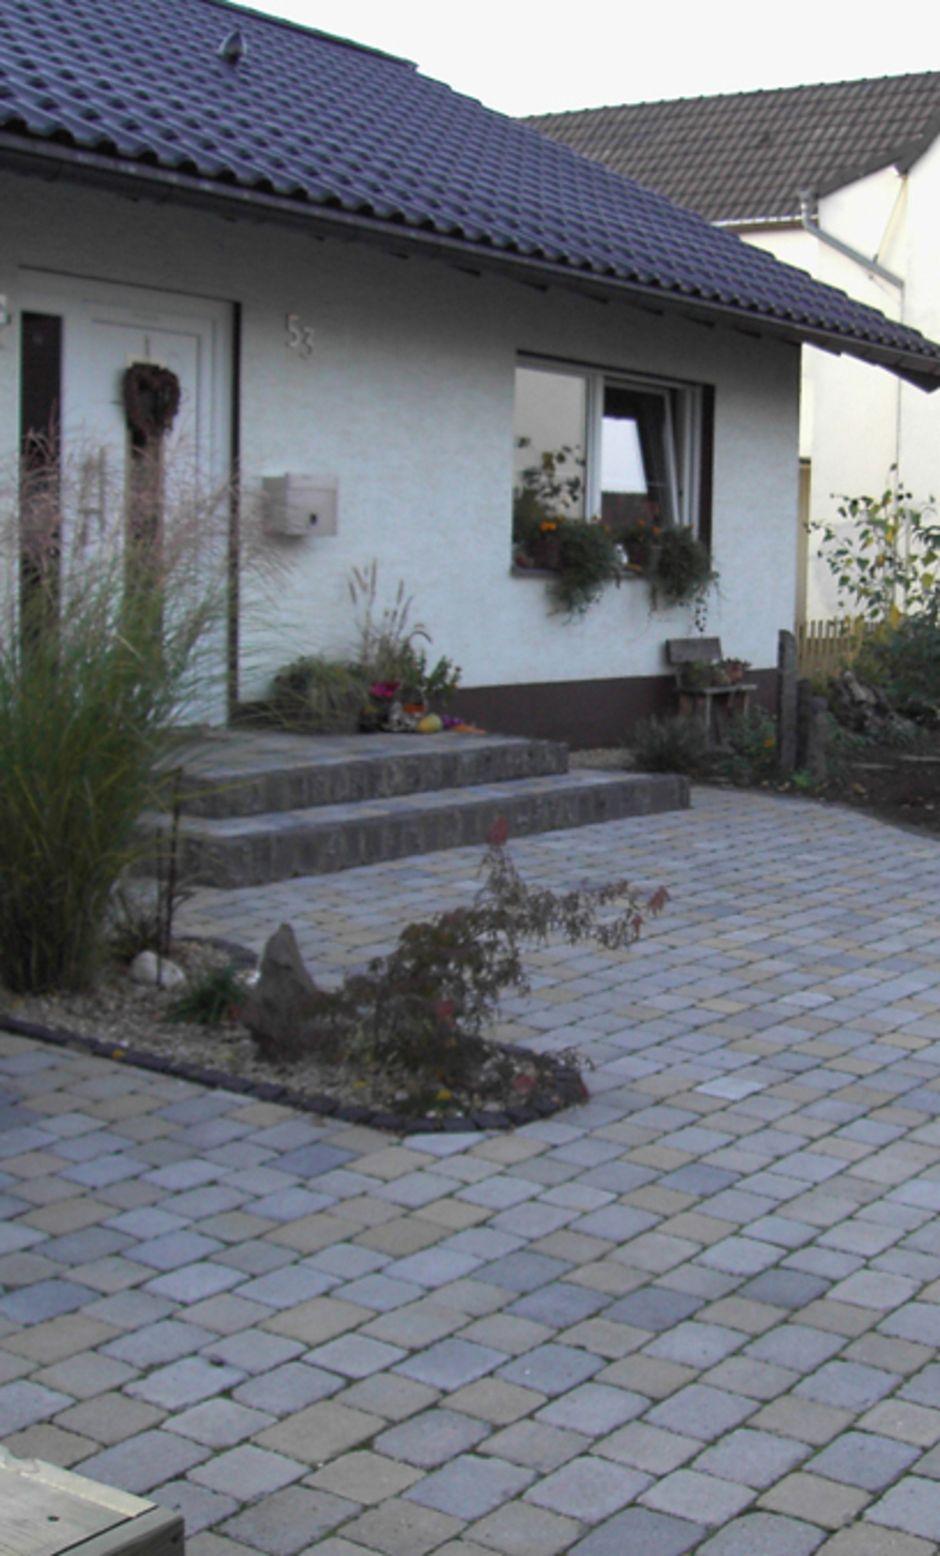 Pflasterarbeiten Naturstein, Beton, Klinker ❀ Gartenbau Troisdorf : betongklinker : Inredning